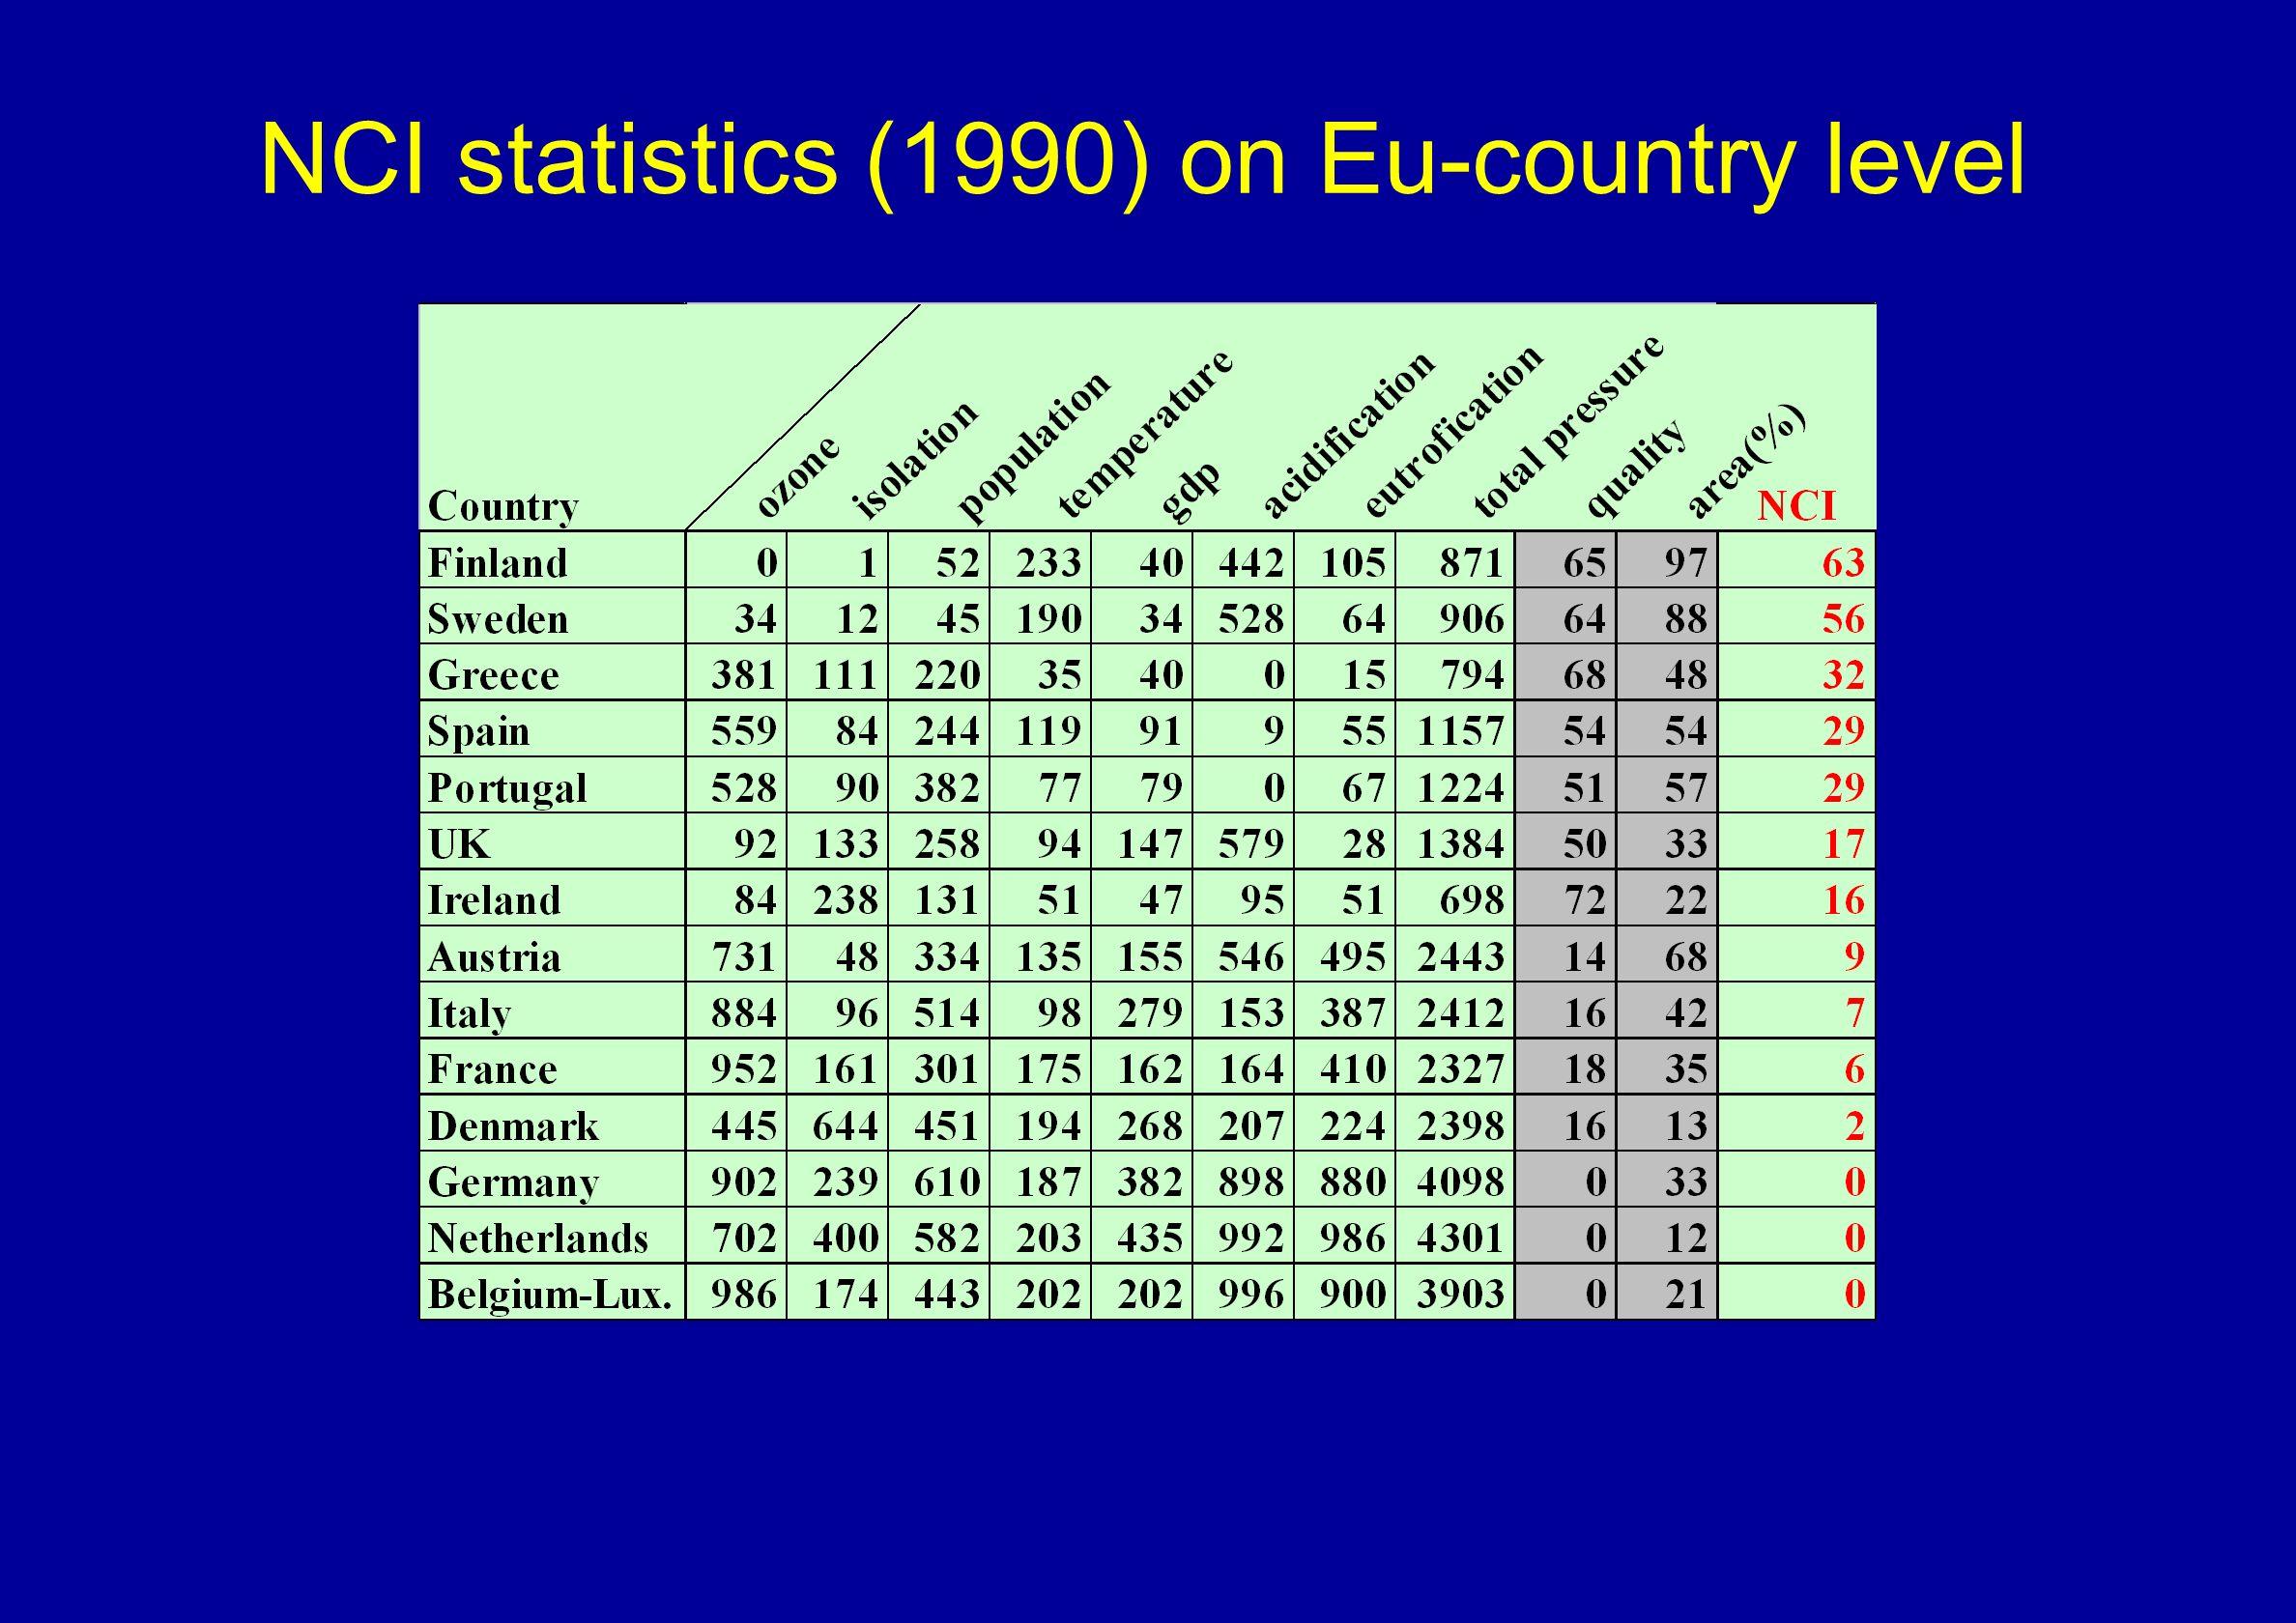 NCI statistics (1990) on Eu-country level